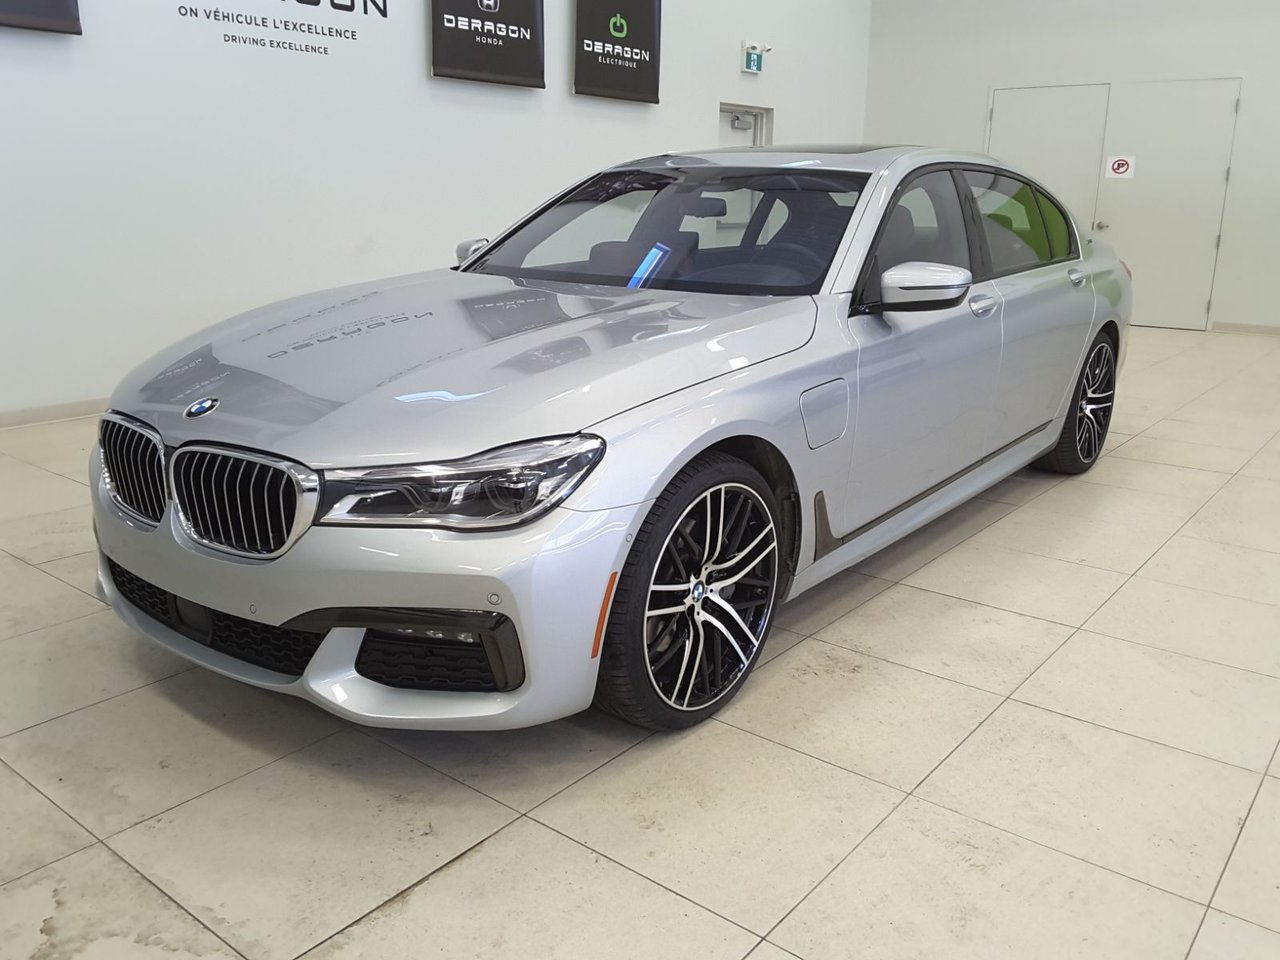 2019 BMW  Série 7 740Le xDrive PDSF/MSRP 149765$